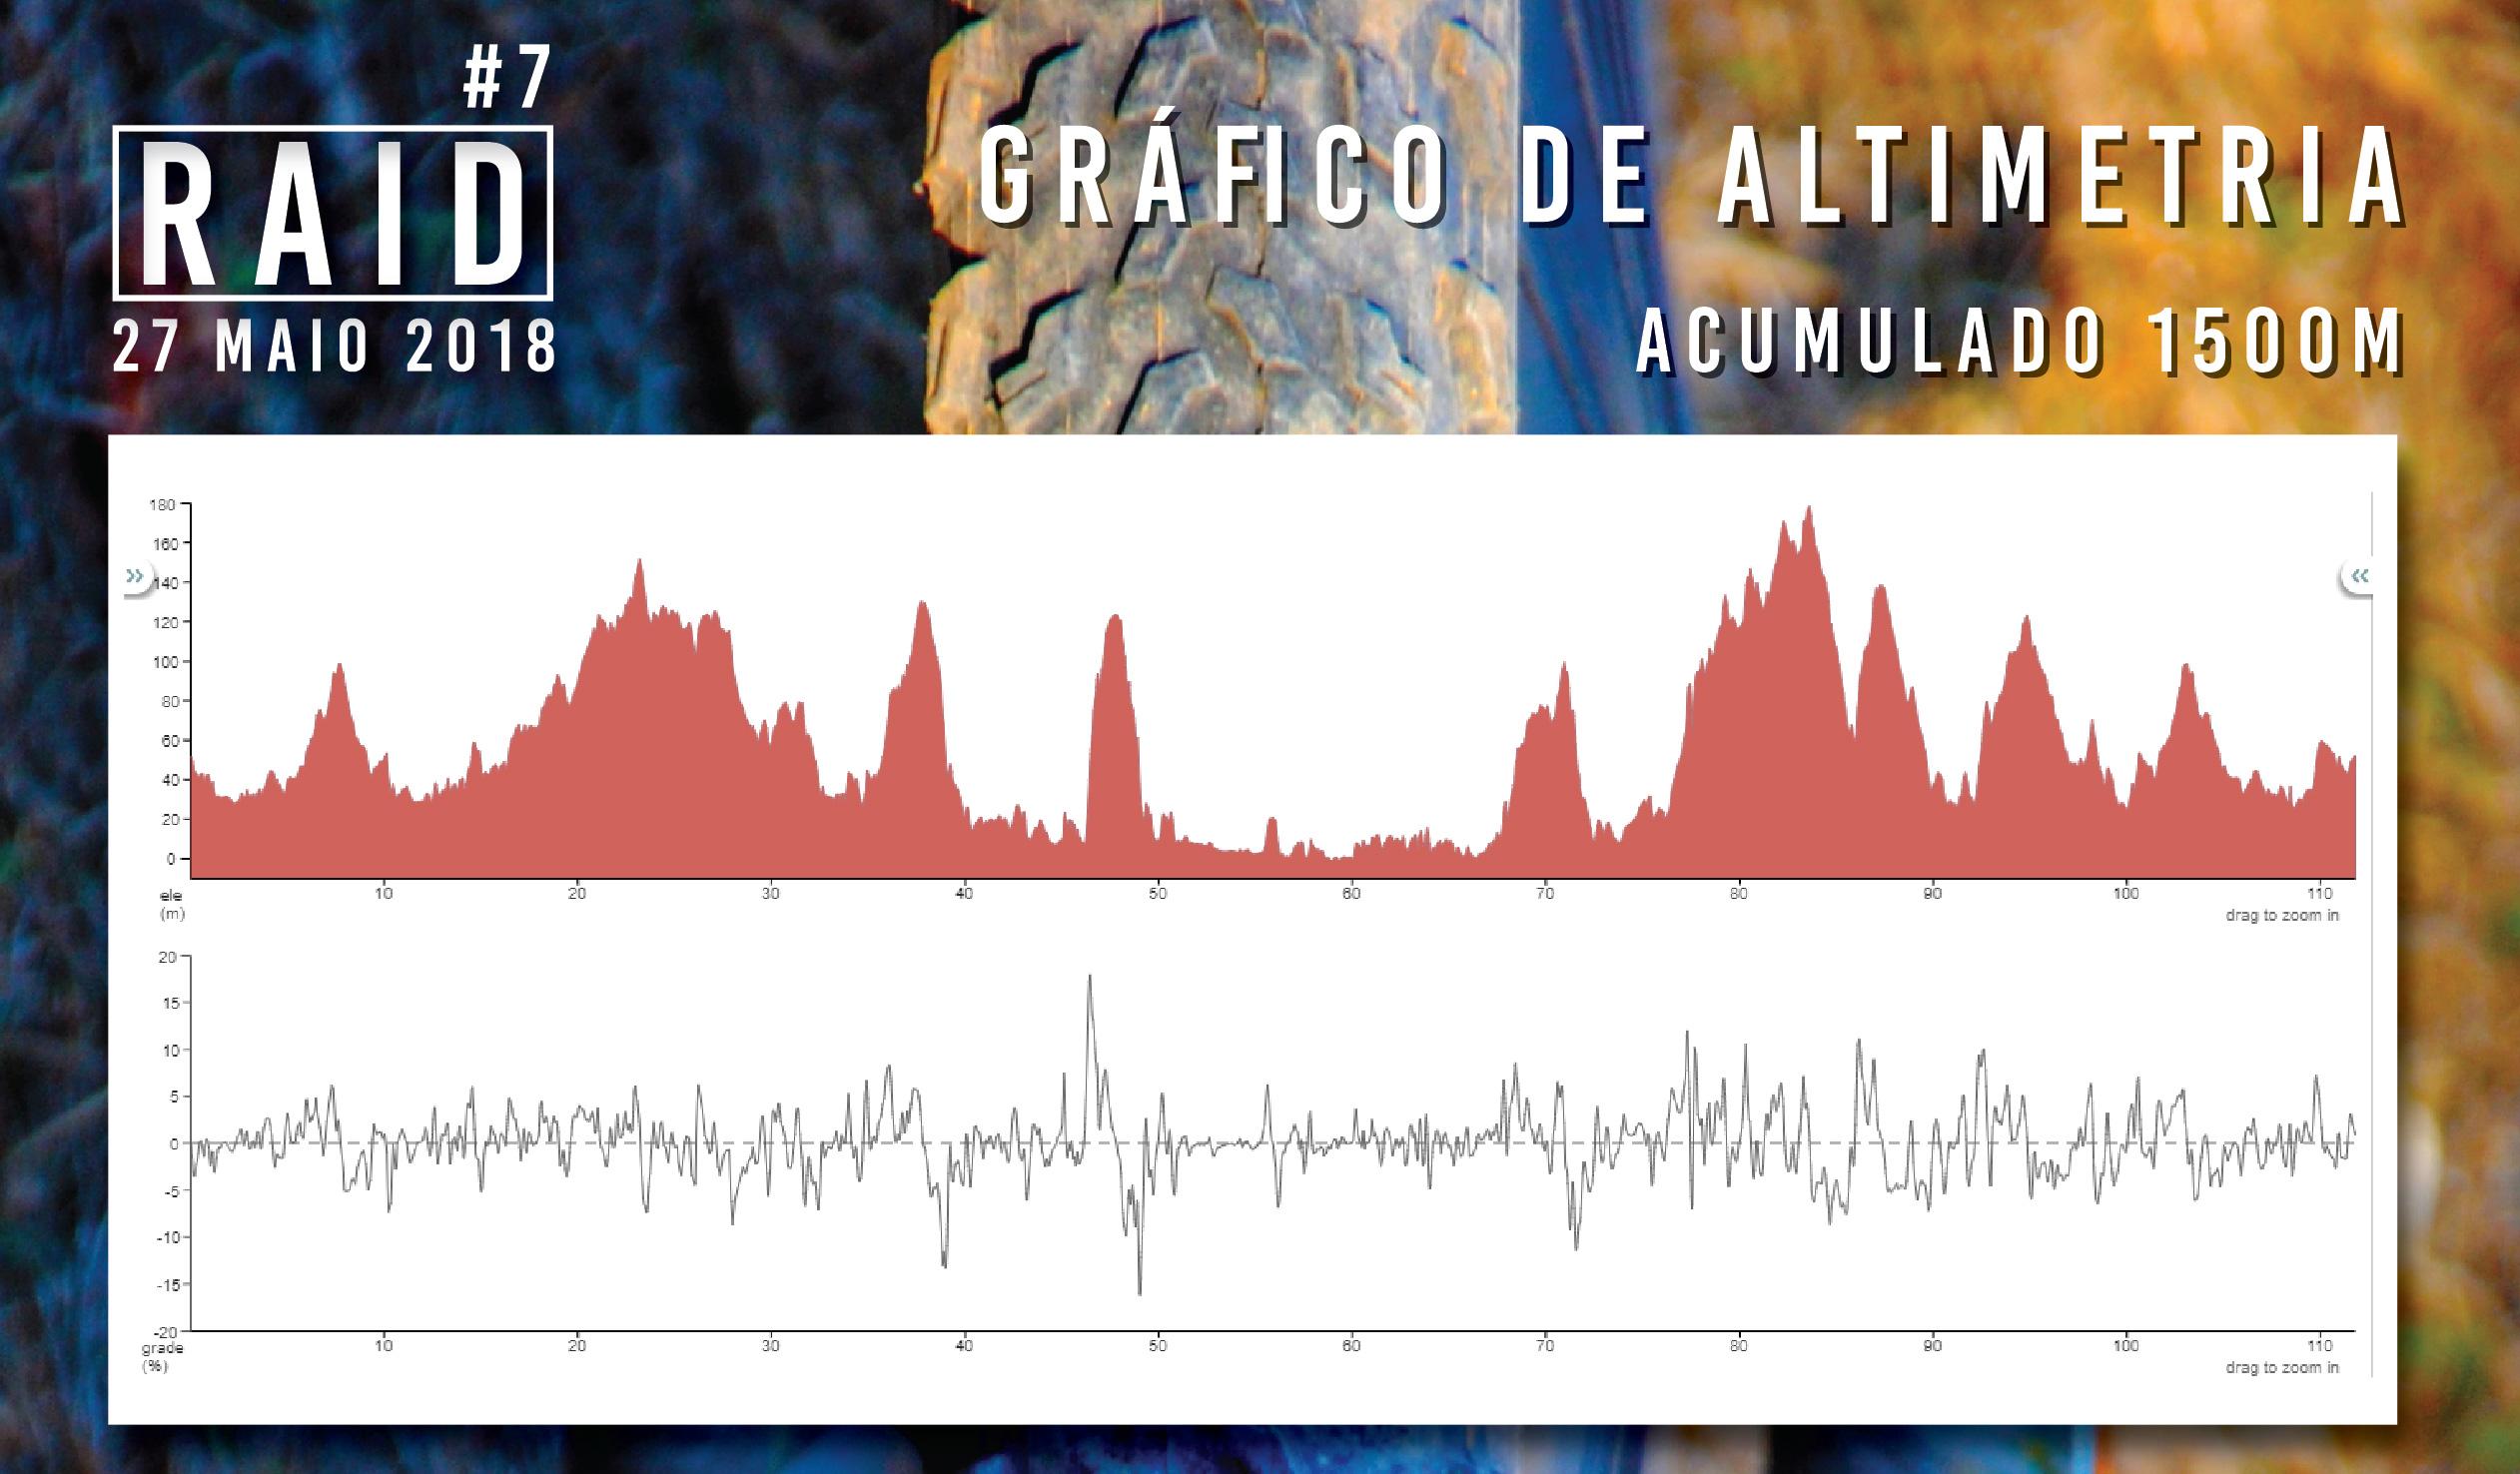 GraficoAltrimetria-06.jpg